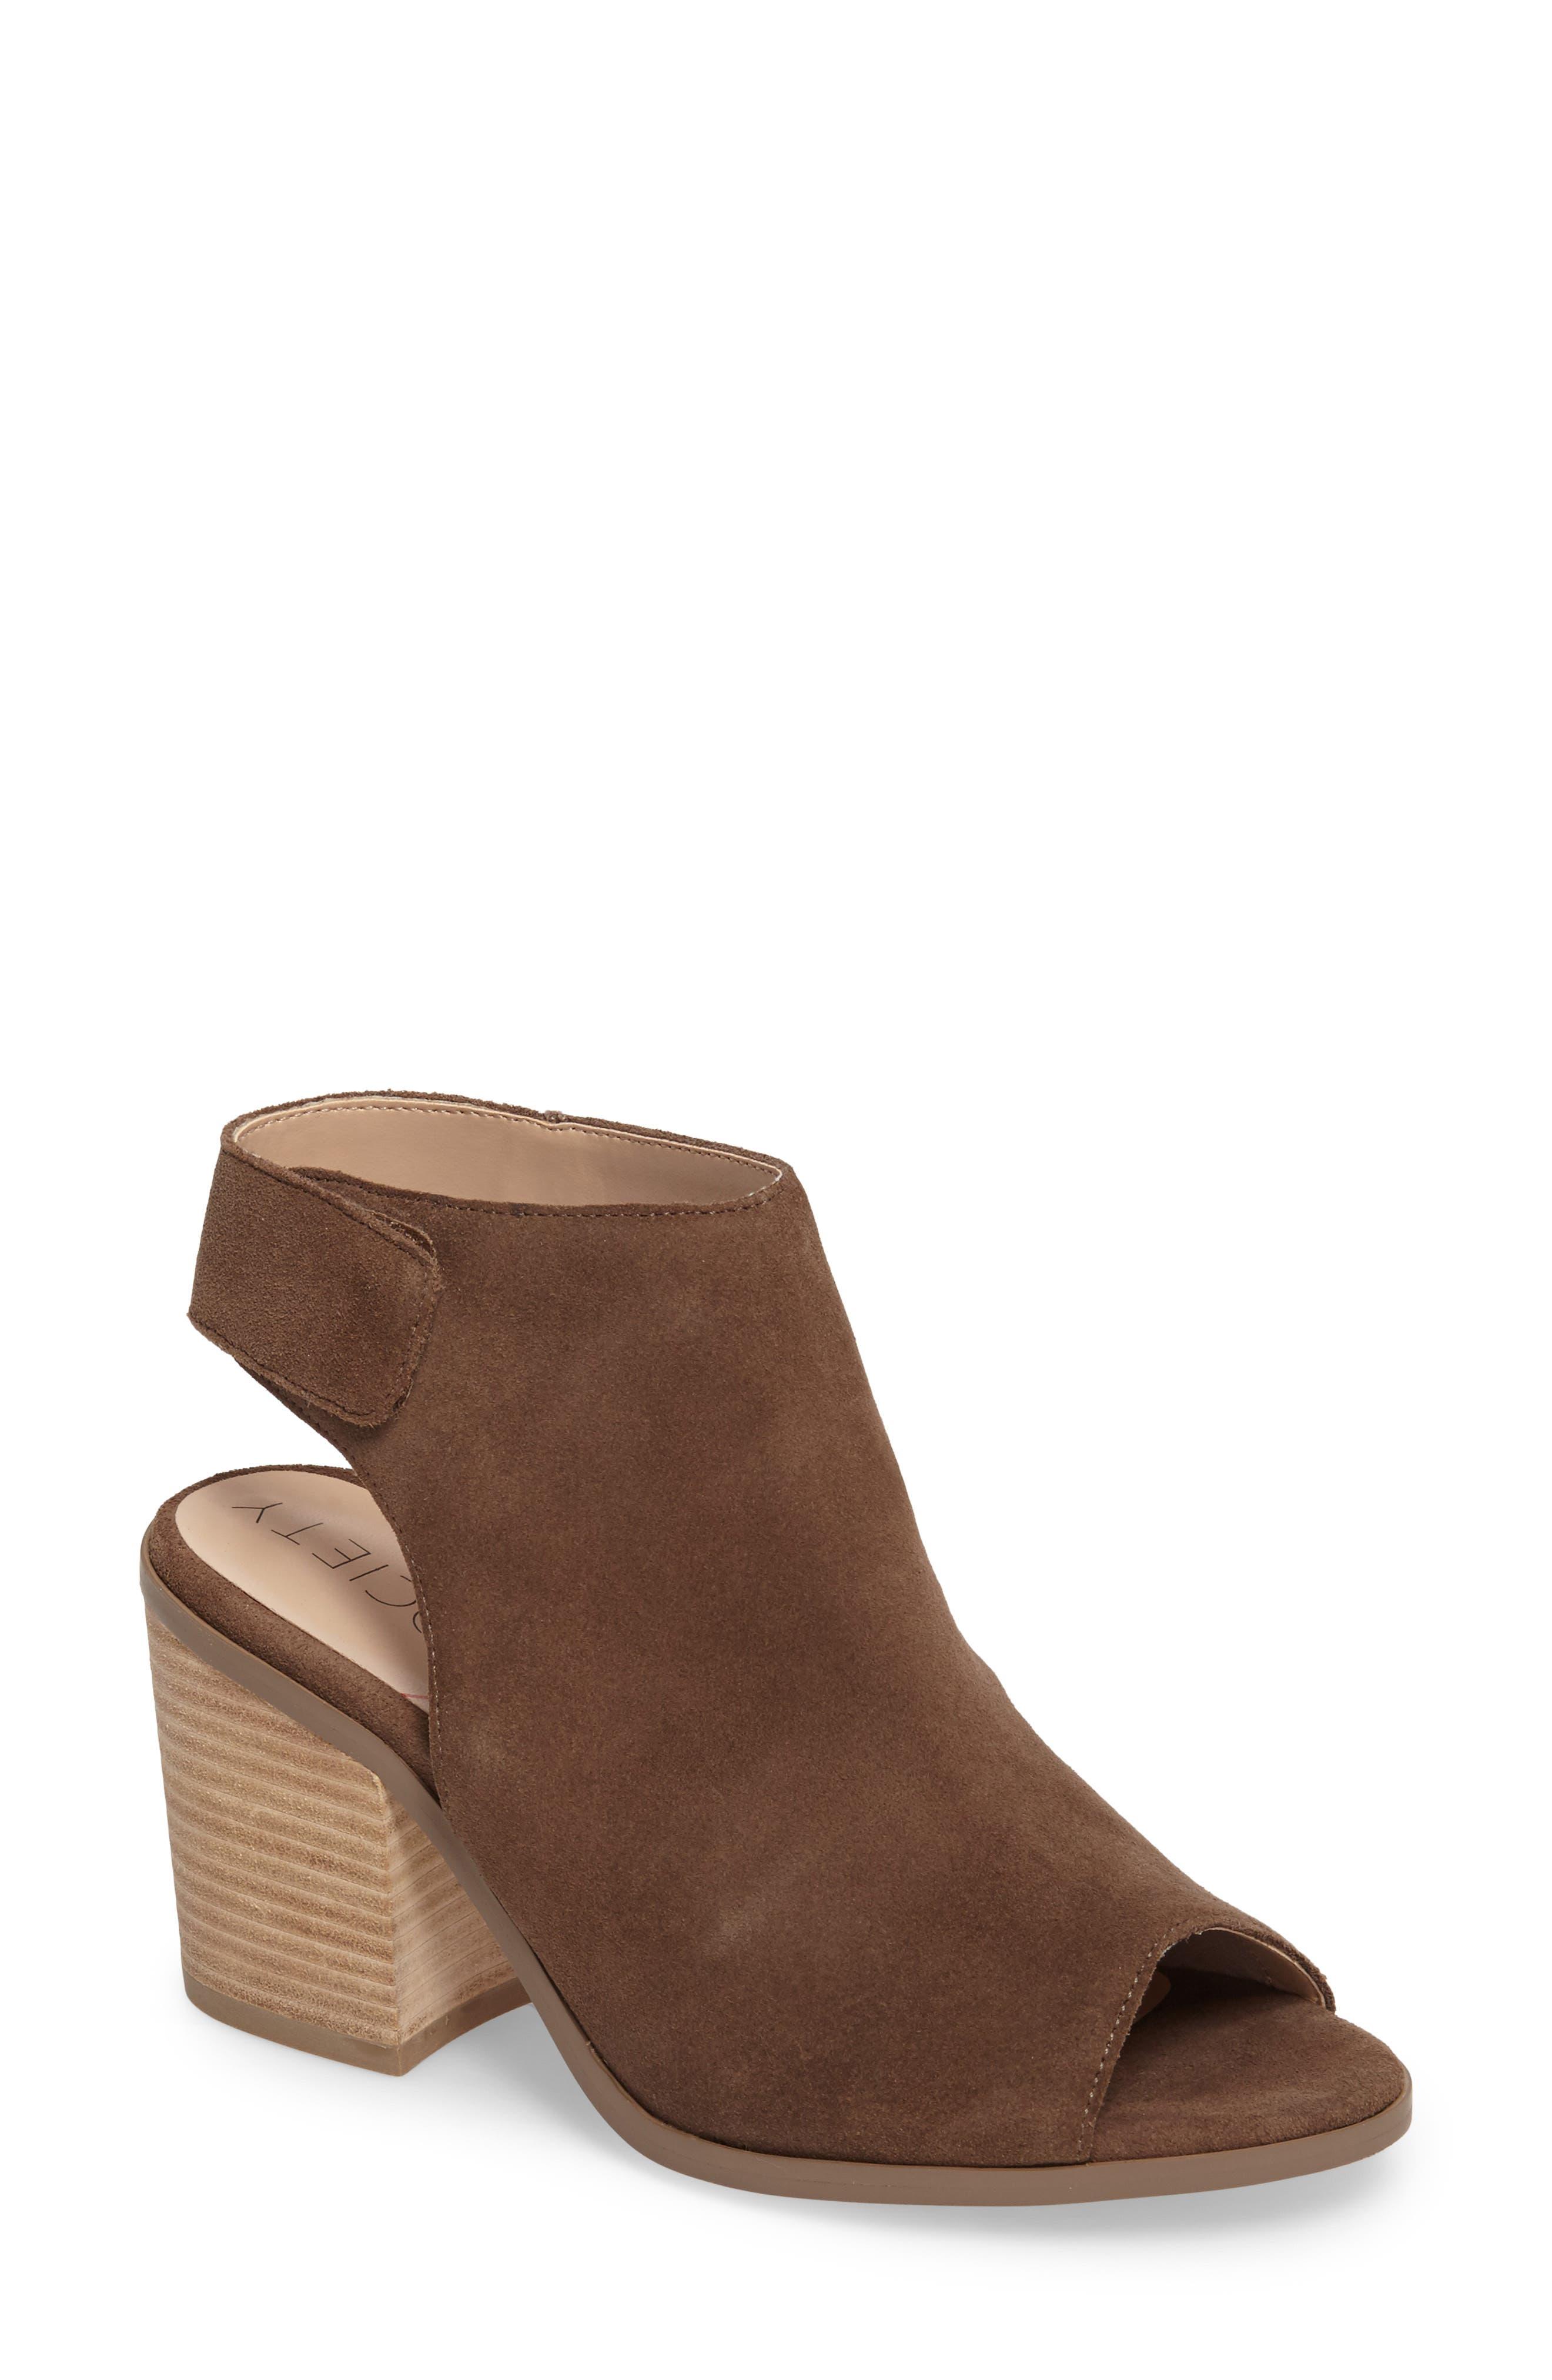 Peep Toe Sandal,                         Main,                         color, Dark Taupe